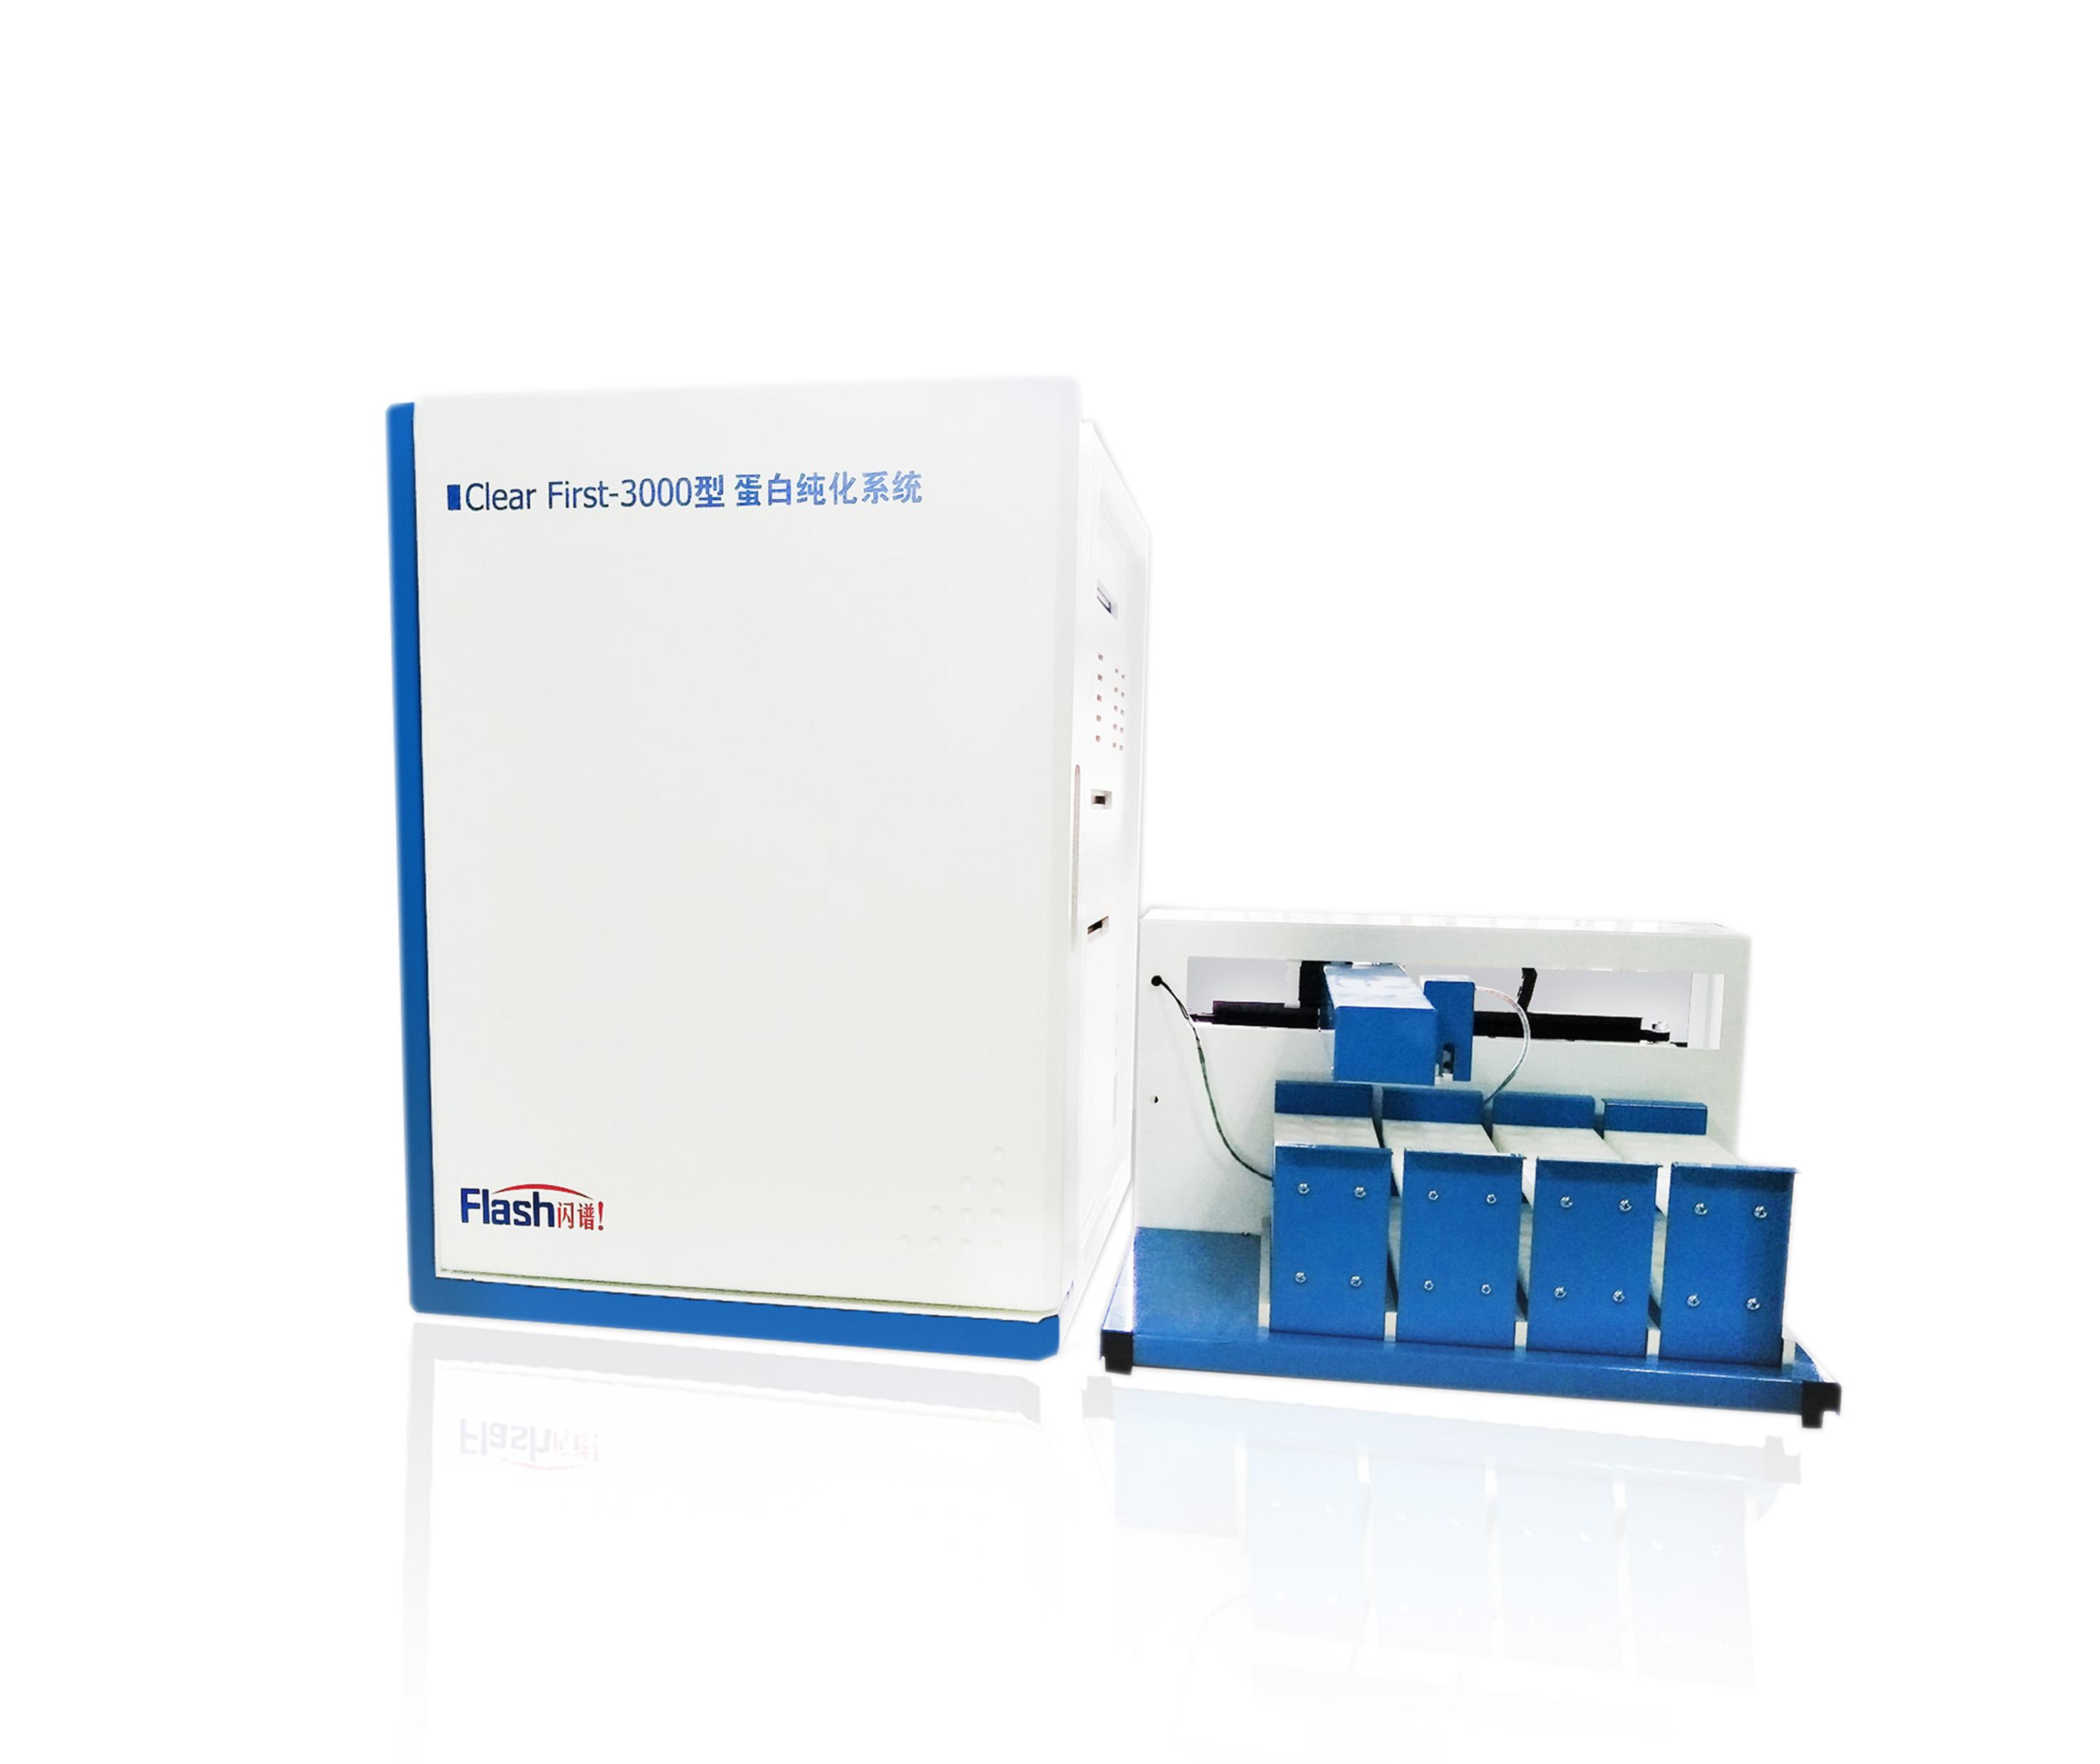 ClearFirst-3000型蛋白纯化系统